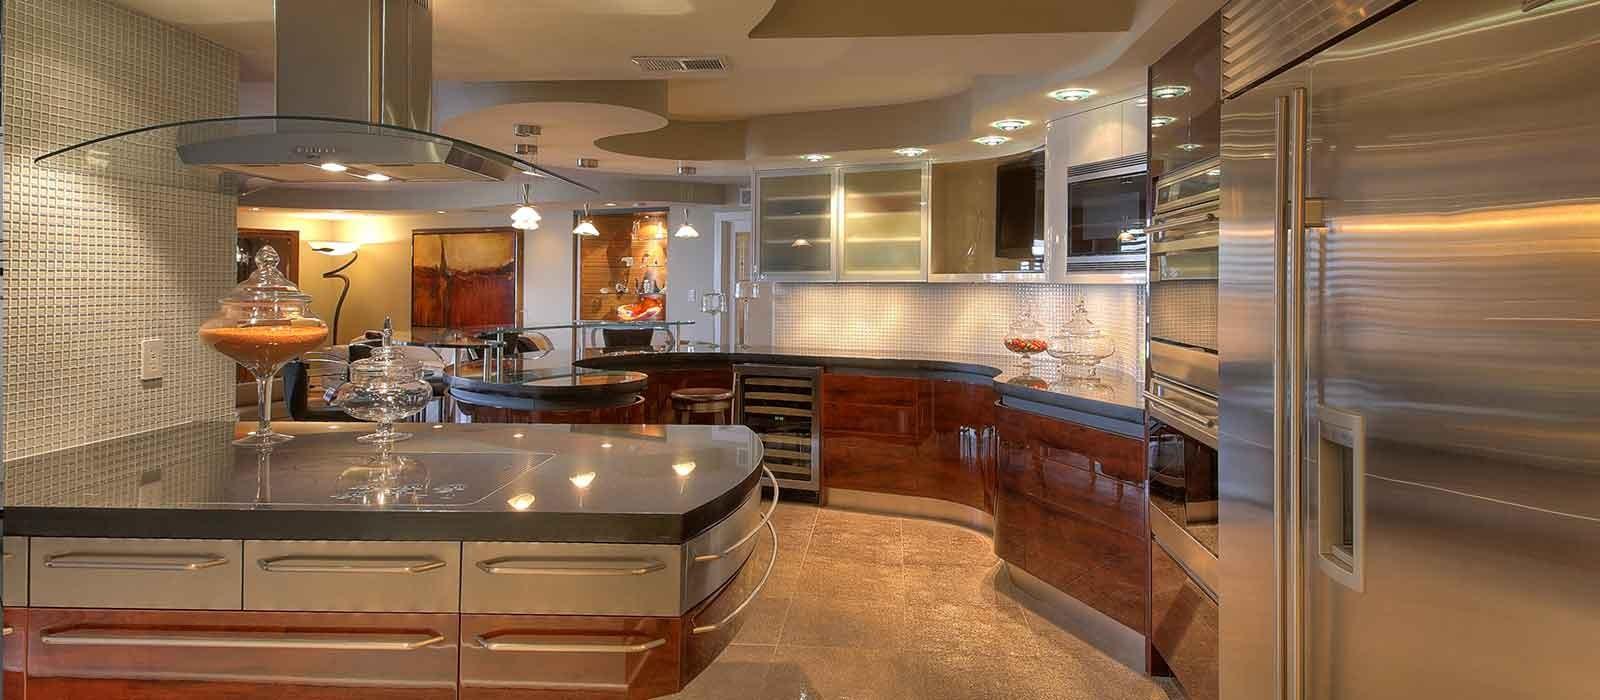 Capitol Design | Award Winning Kitchen & Bathroom Design ...